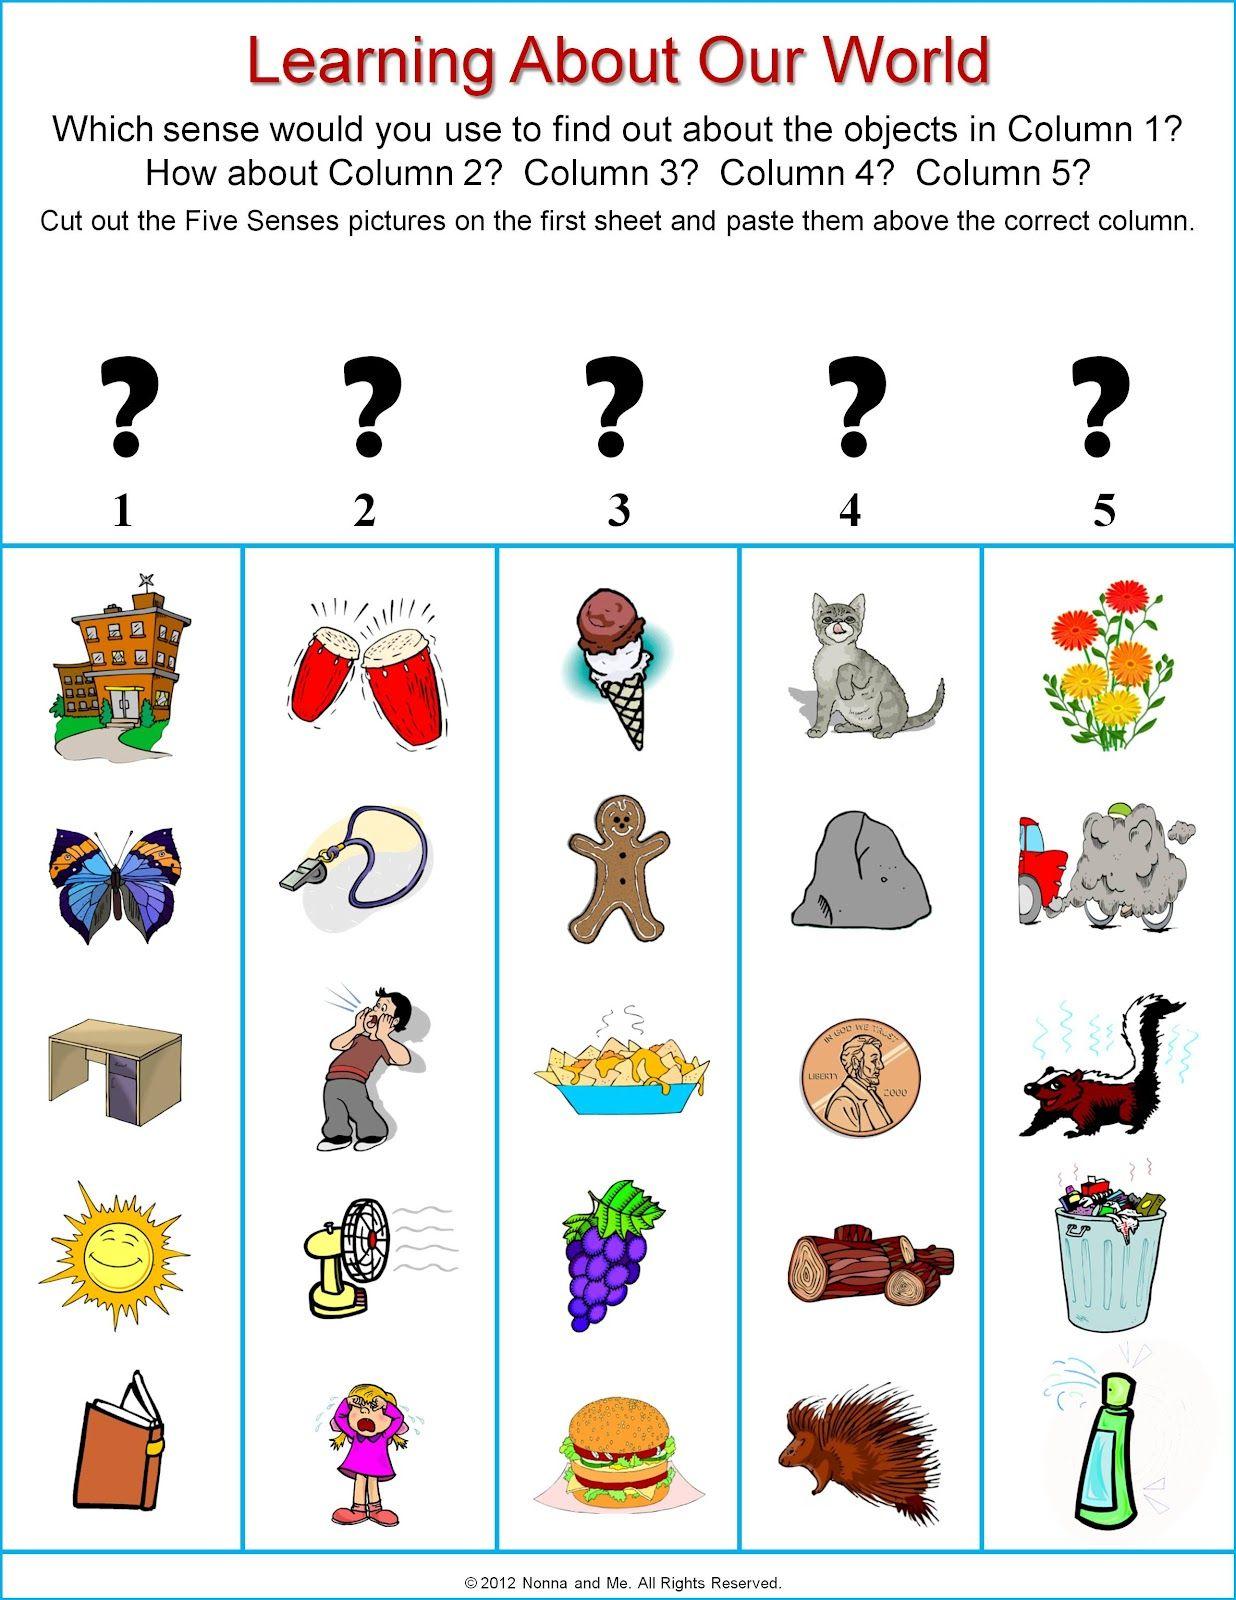 1st grade science the five senses homeschooling 1st grade science autistic children grade 1. Black Bedroom Furniture Sets. Home Design Ideas